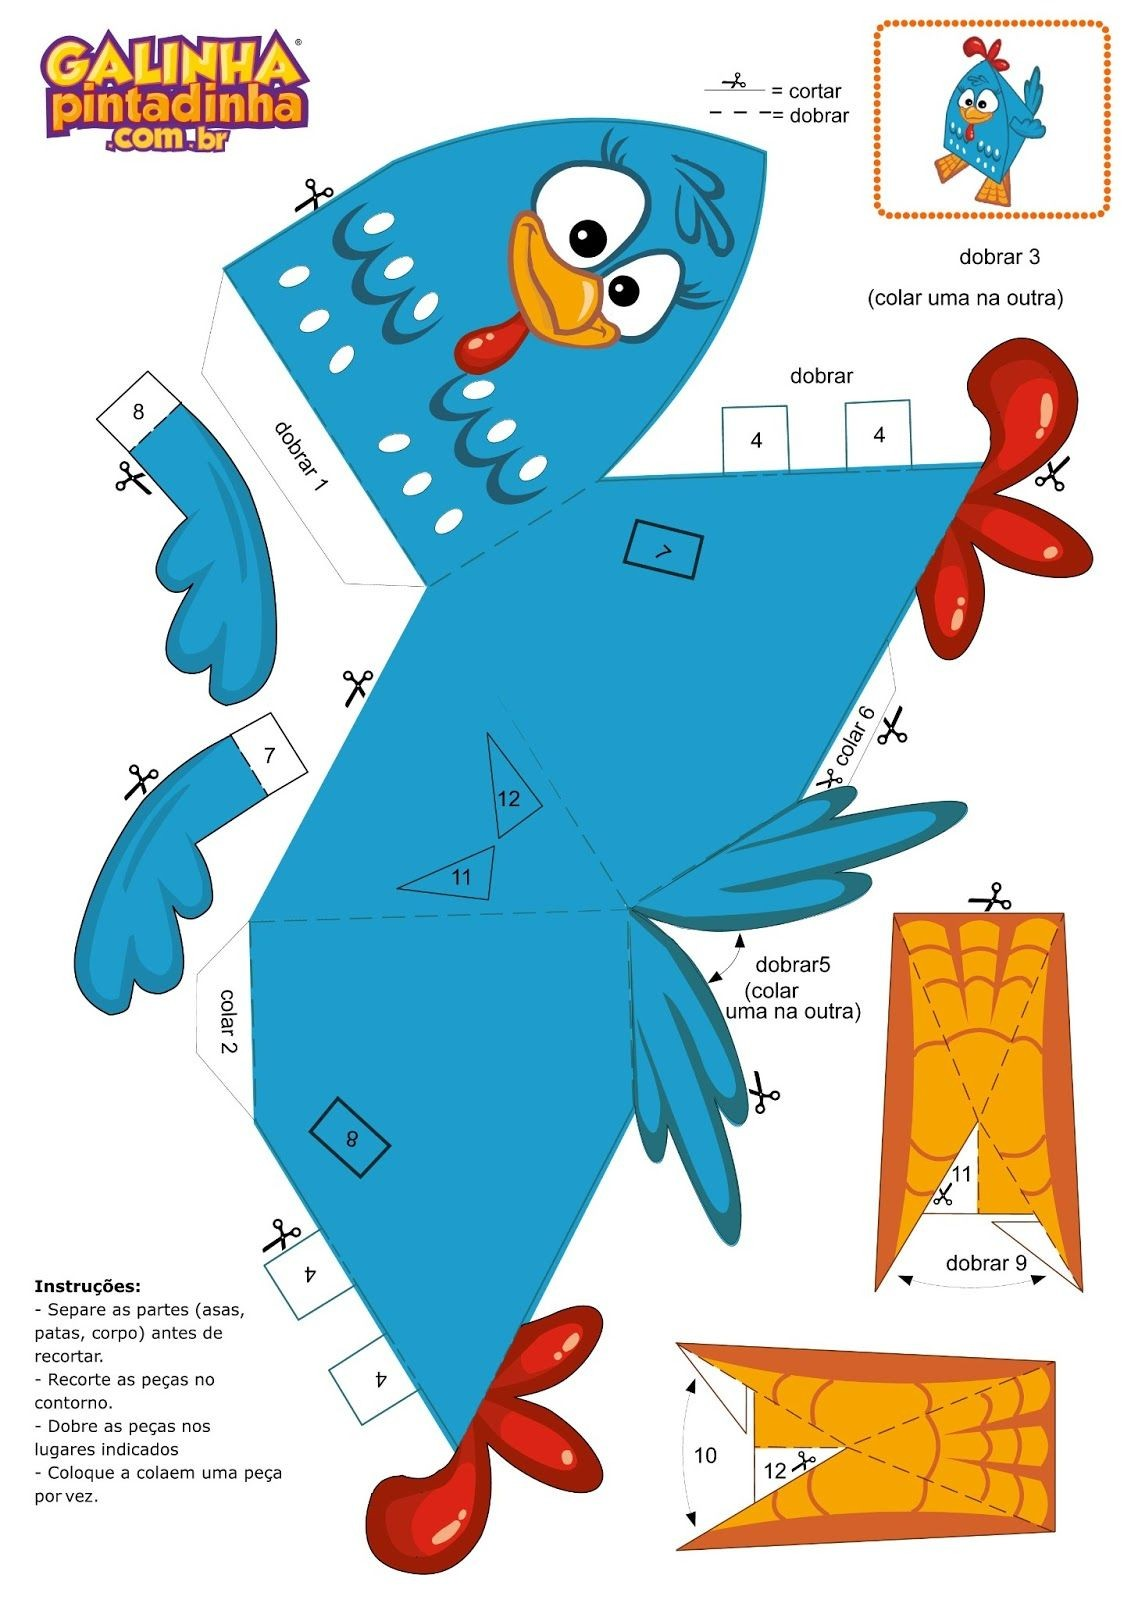 Sonic Papercraft Kit Festa Galinha Pintadinha Para Imprimir Grátis